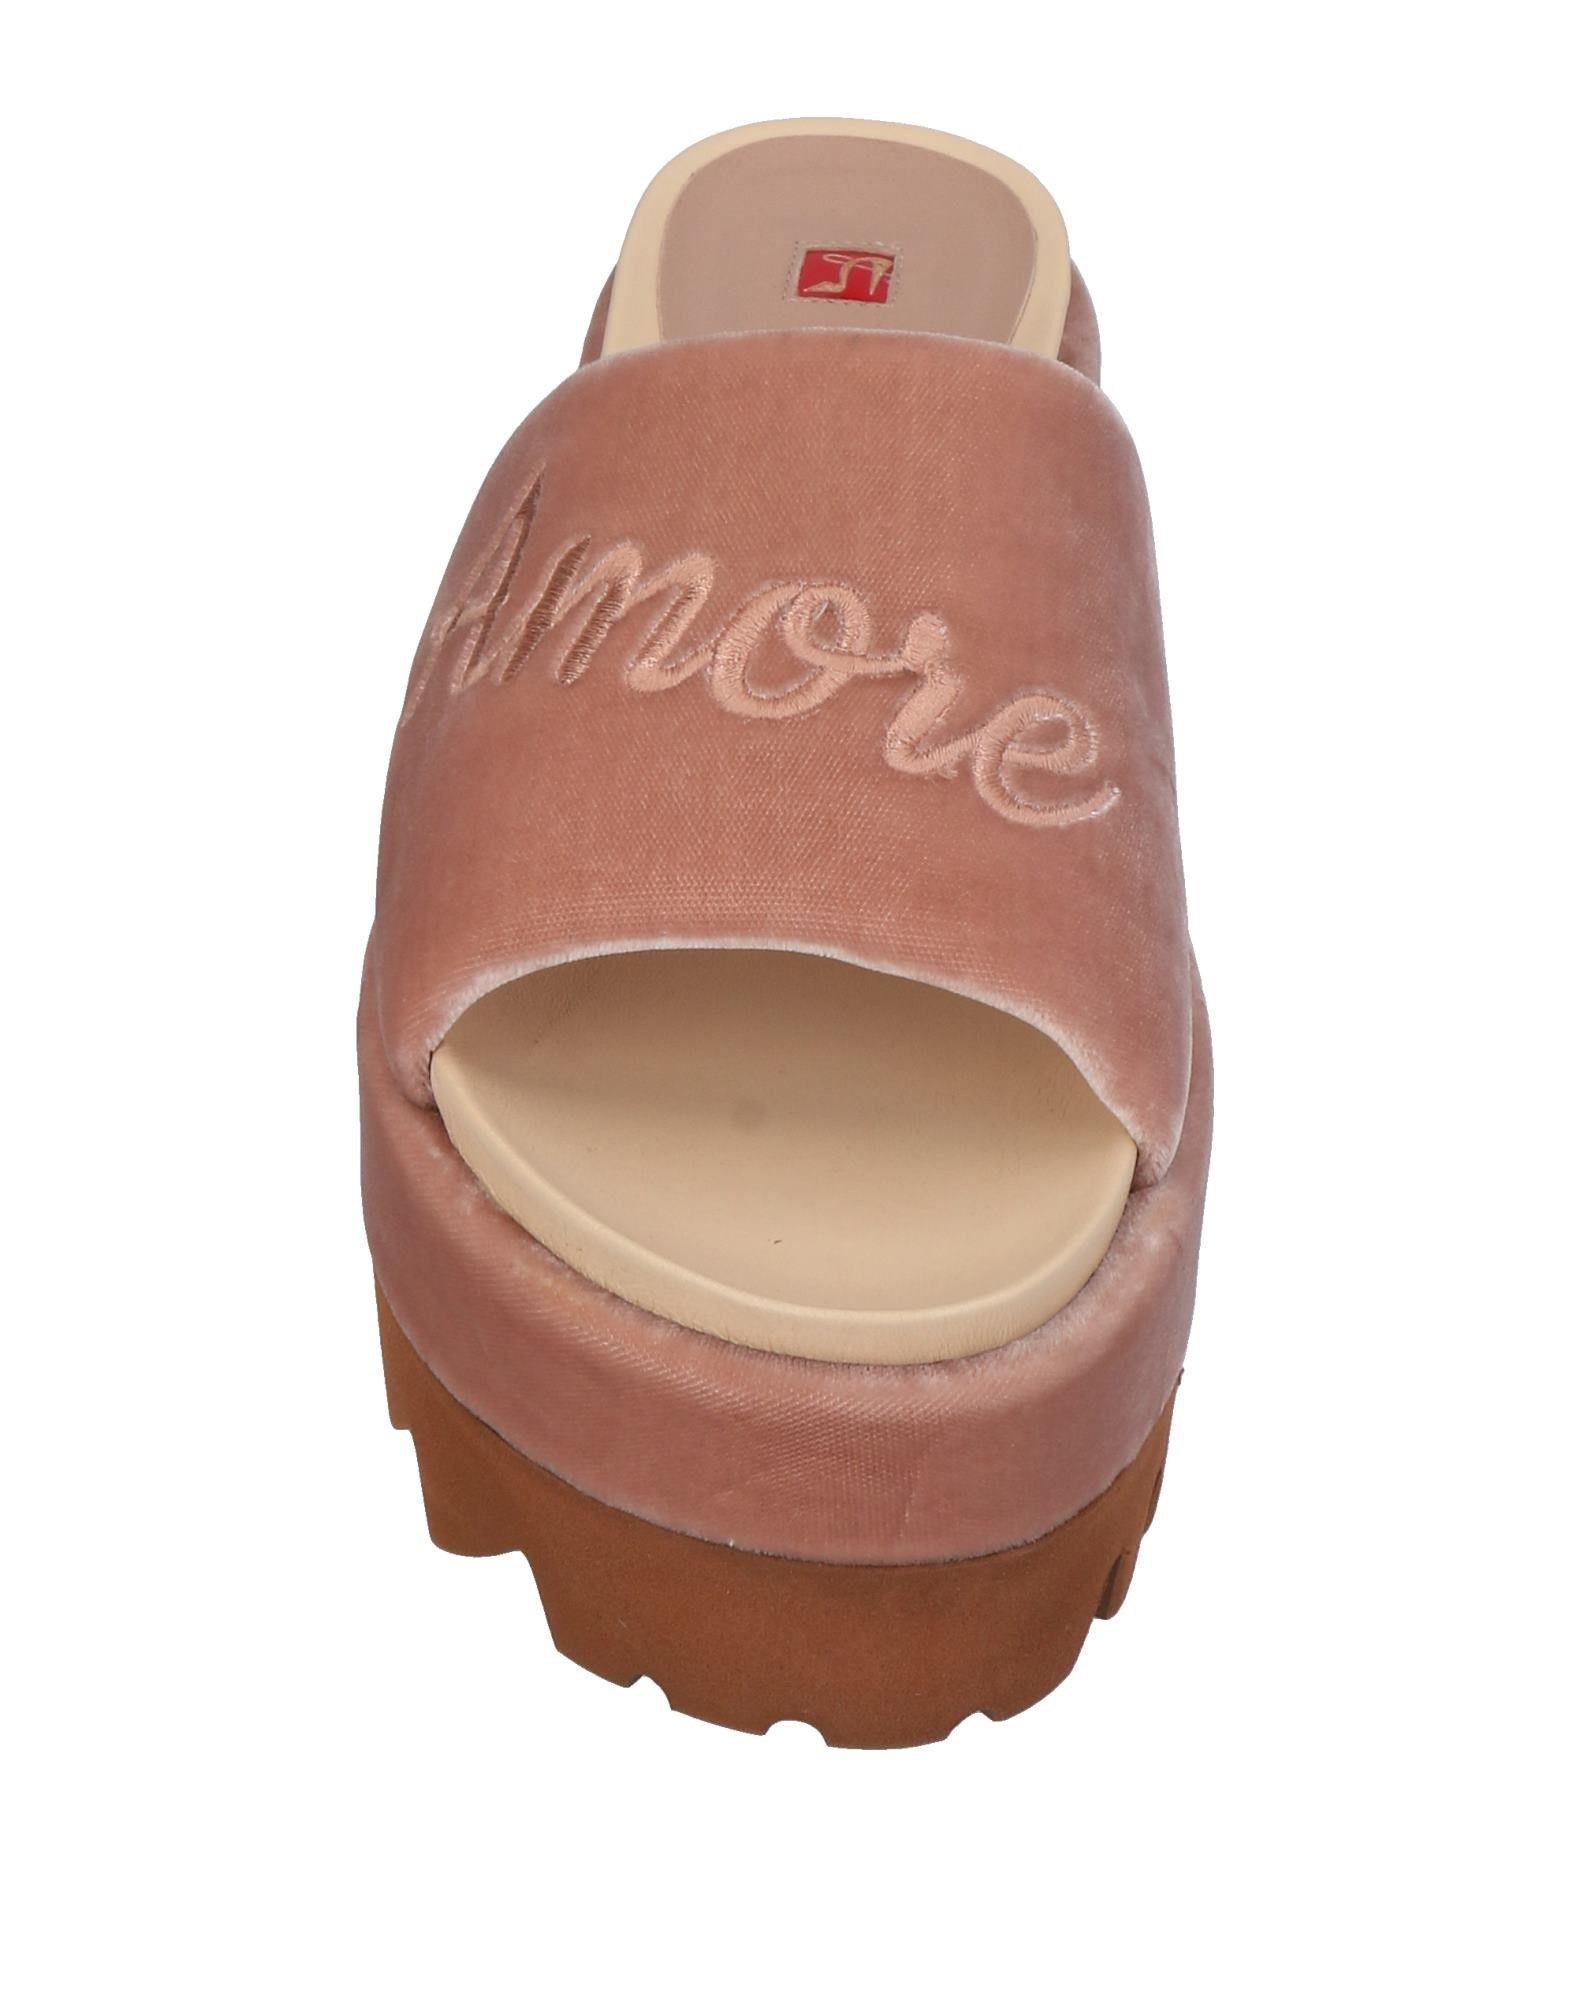 Stilvolle billige Sandalen Schuhe Ballin Sandalen billige Damen  11432406GW 5c9452